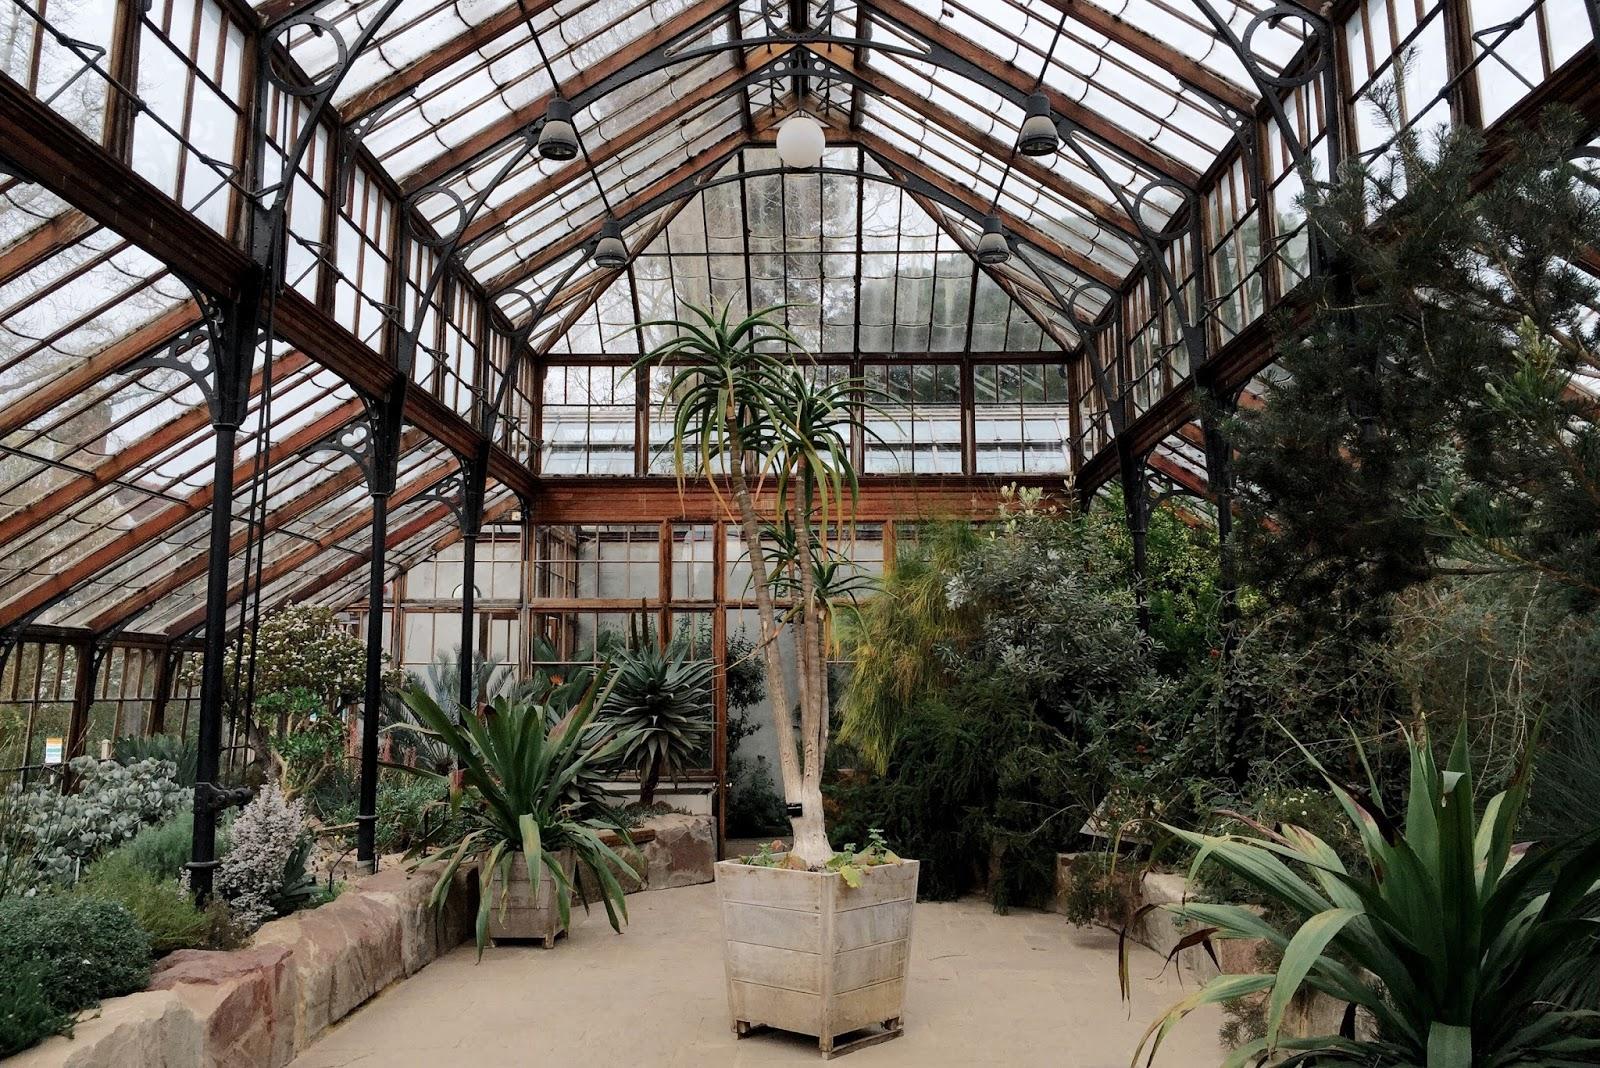 Early Spring In The Cambridge University Botanic Garden In